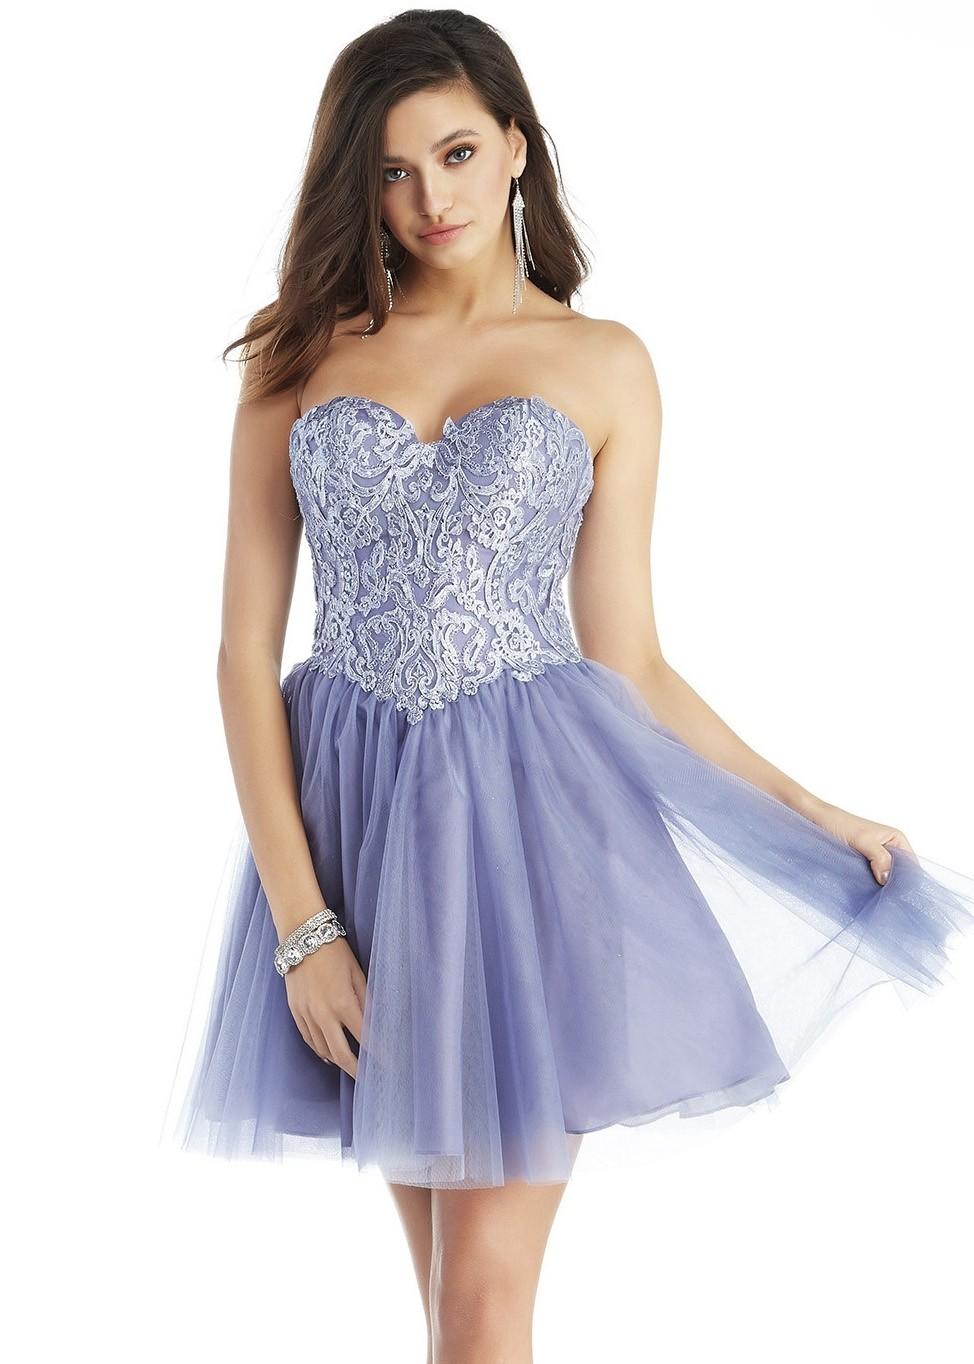 Alyce 3052 Lavender Violet Corset Party Dress